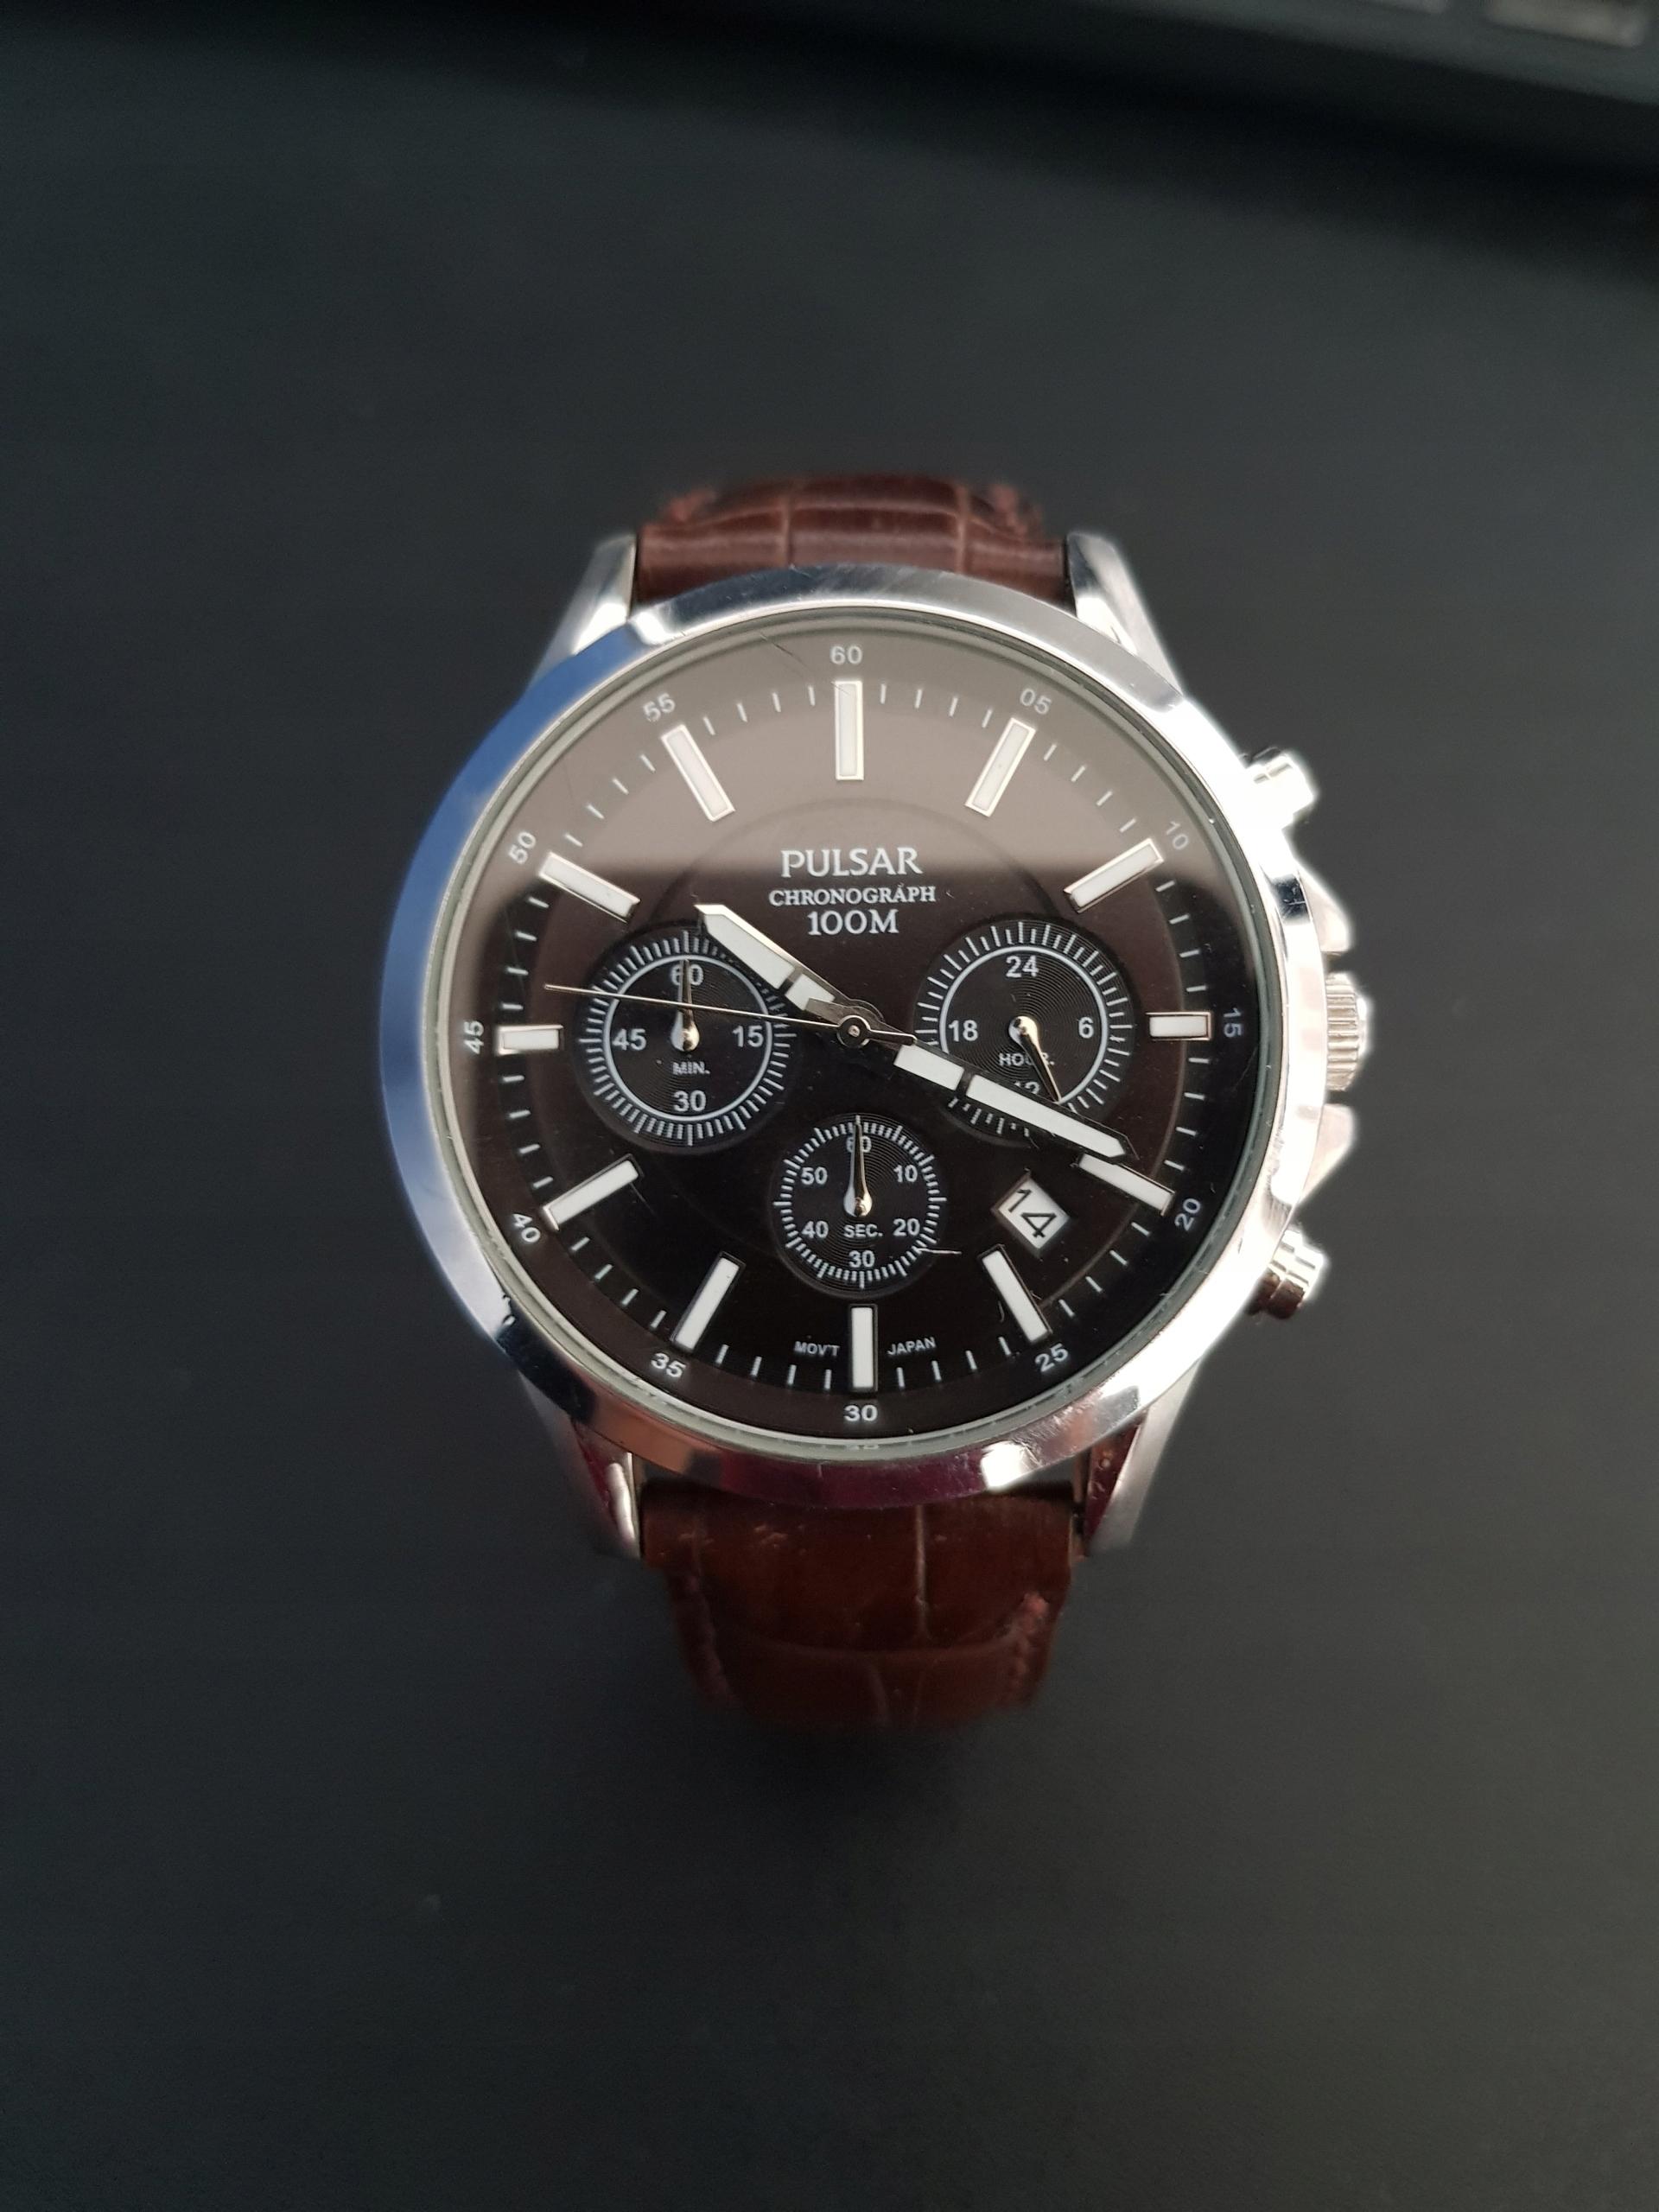 Zegarek męski Pulsar vd53-x012 chronograf 100M